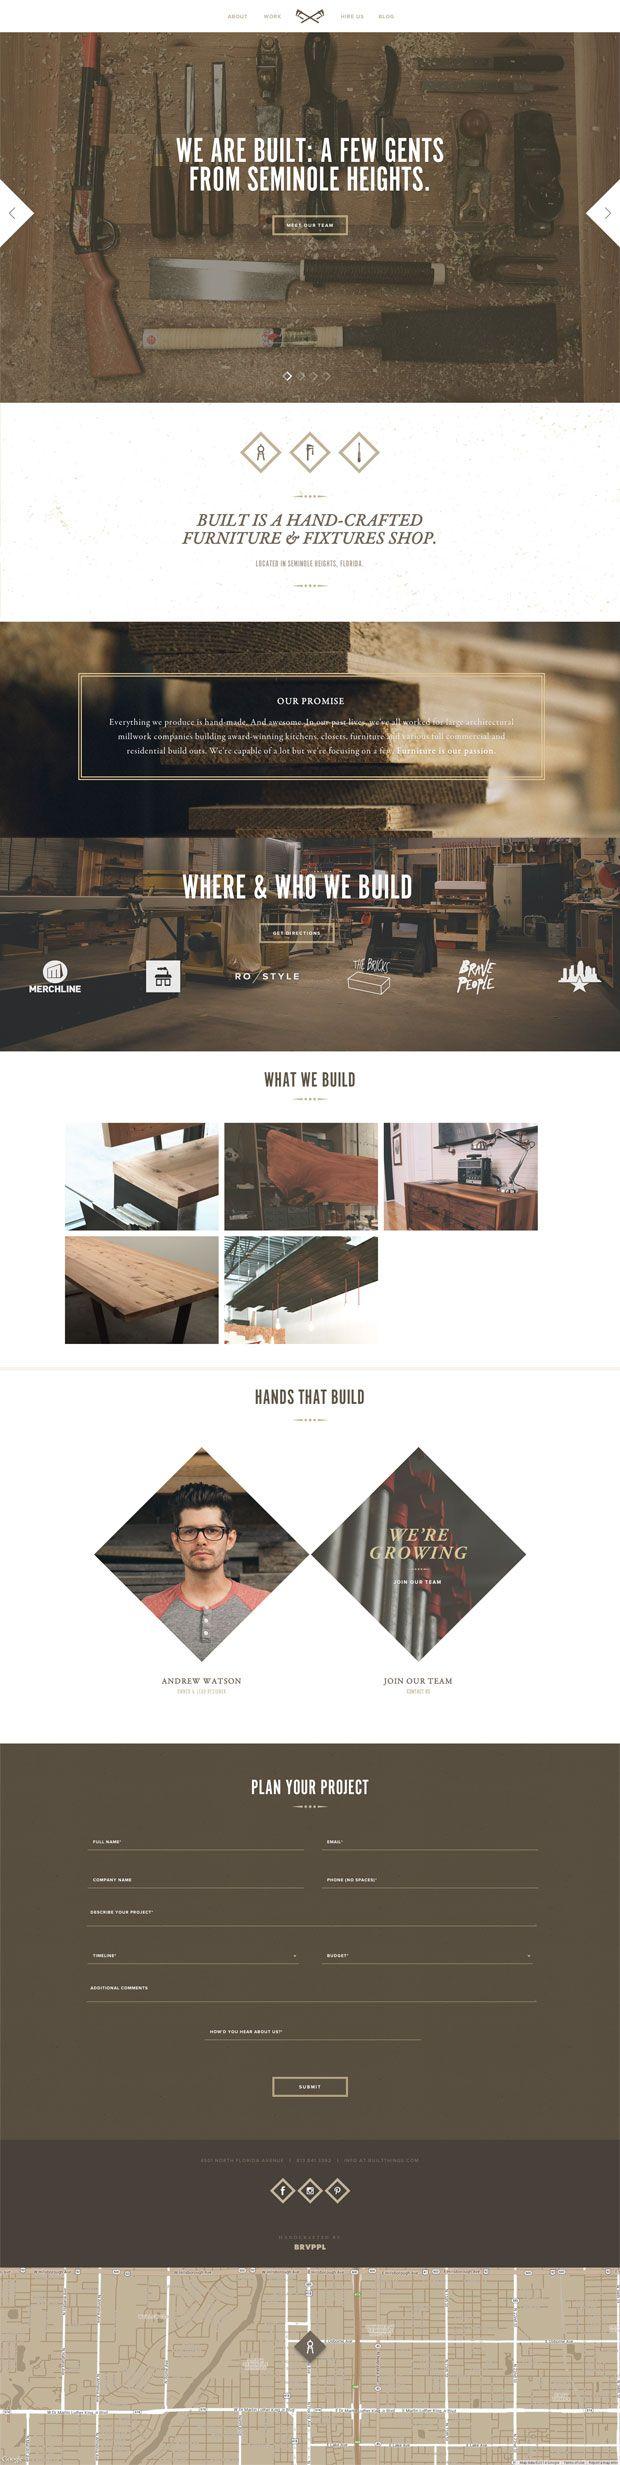 builtthings - long scroll - custom furniture web site